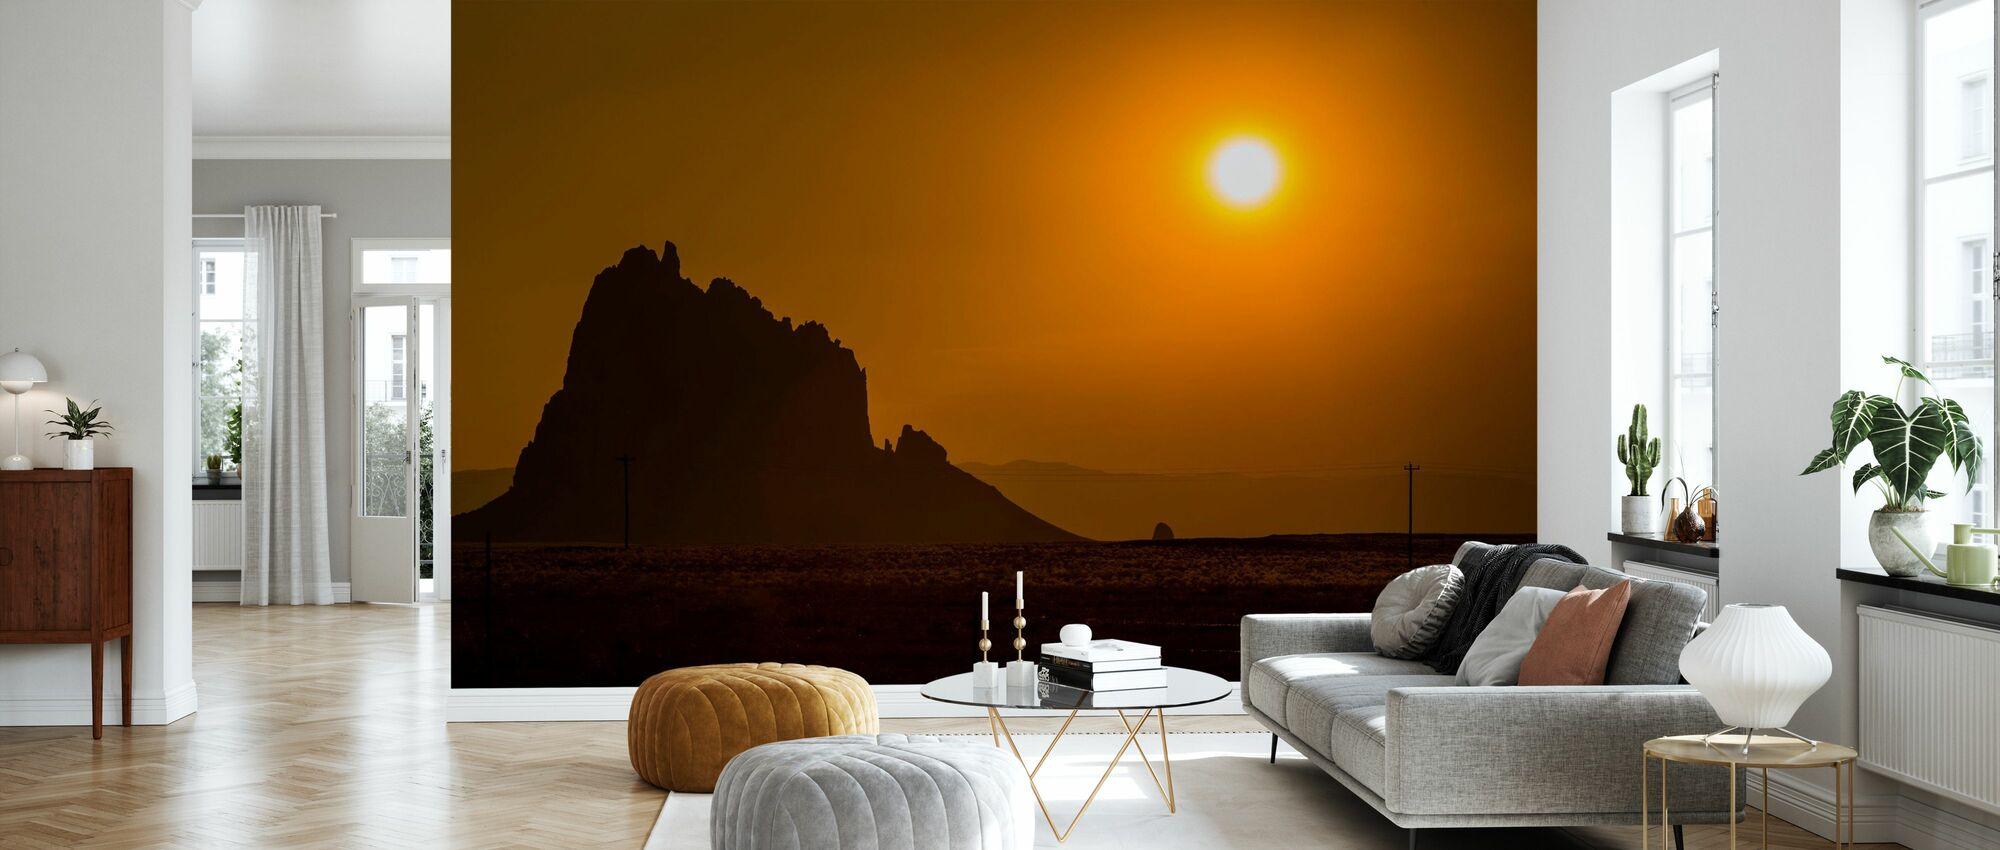 Shiprock at Sunset - Wallpaper - Living Room